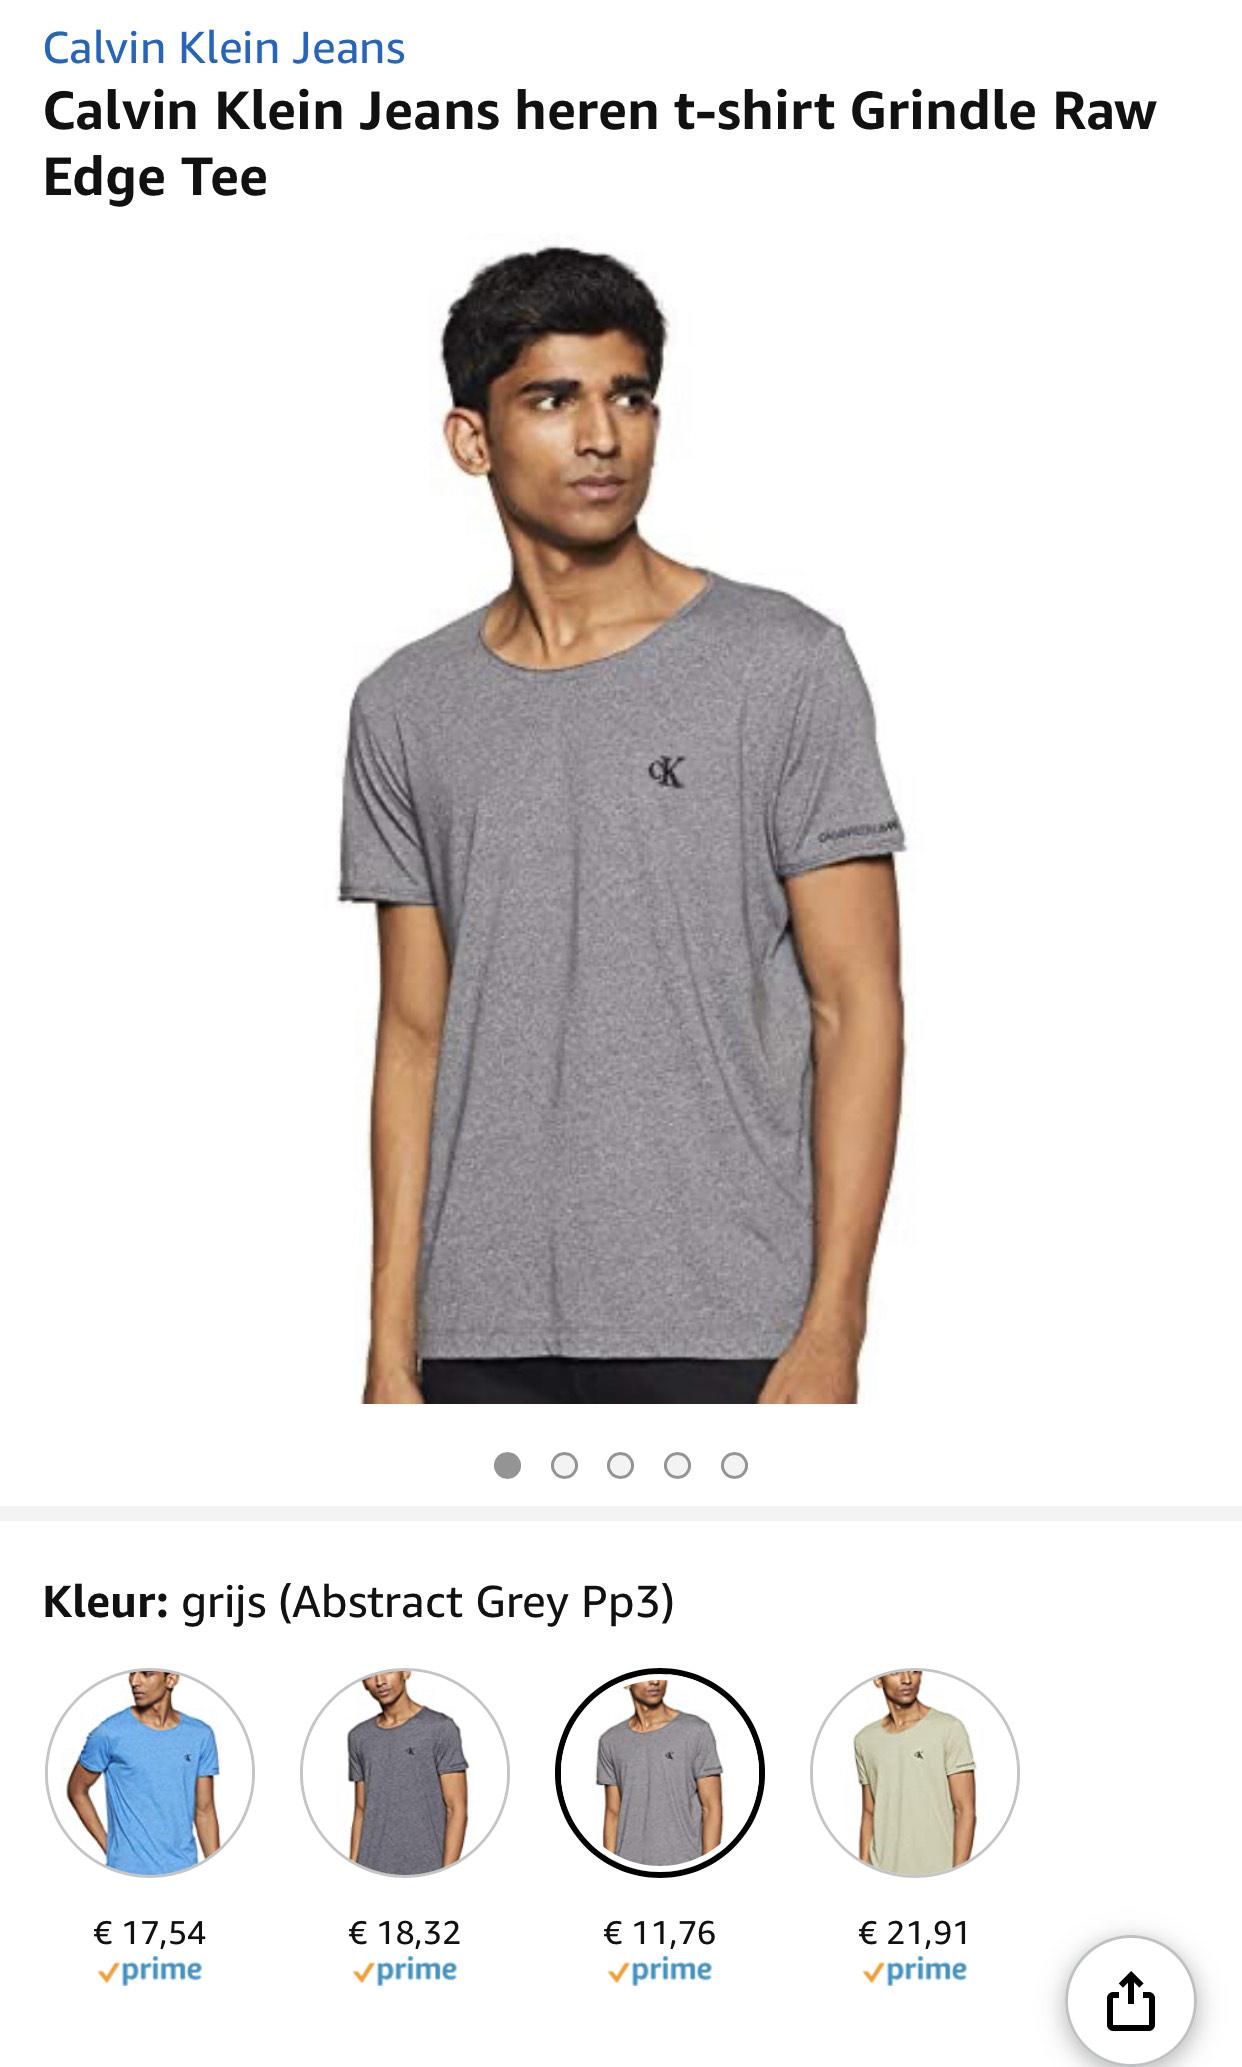 Calvin Klein Jeans heren t-shirt vanaf €11,76